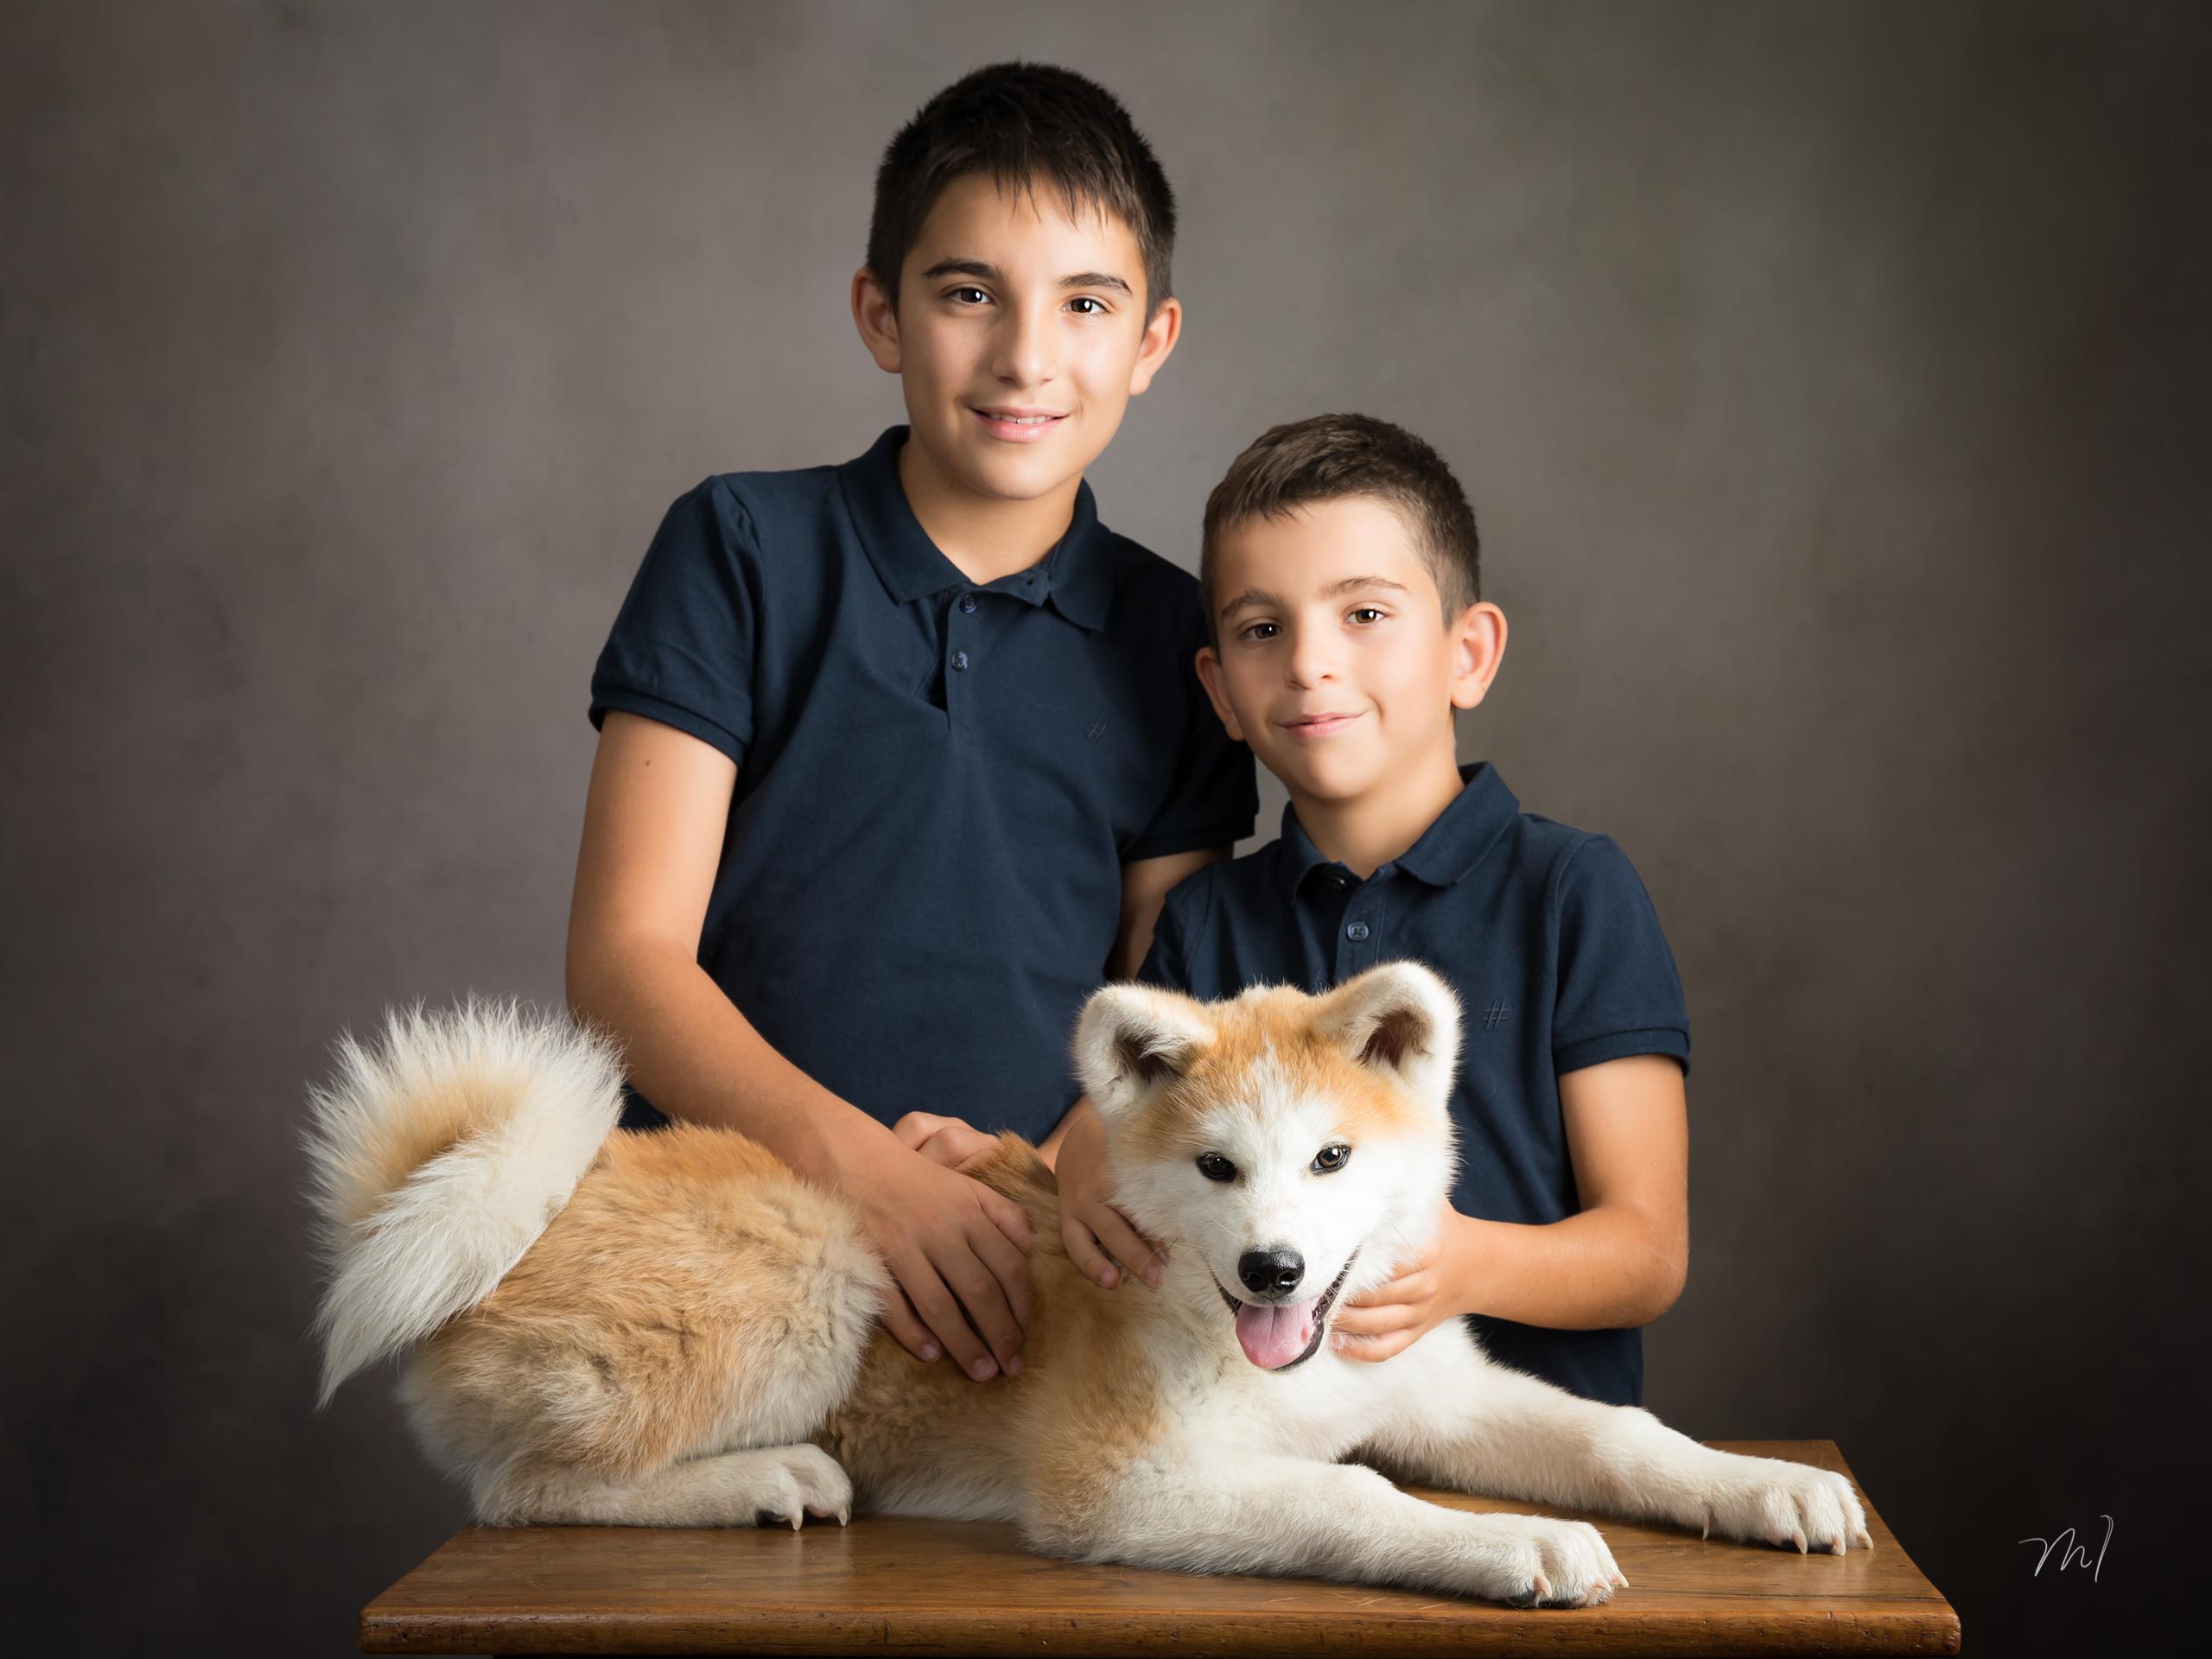 Familles & enfants - Marie Ismalun photographe-22